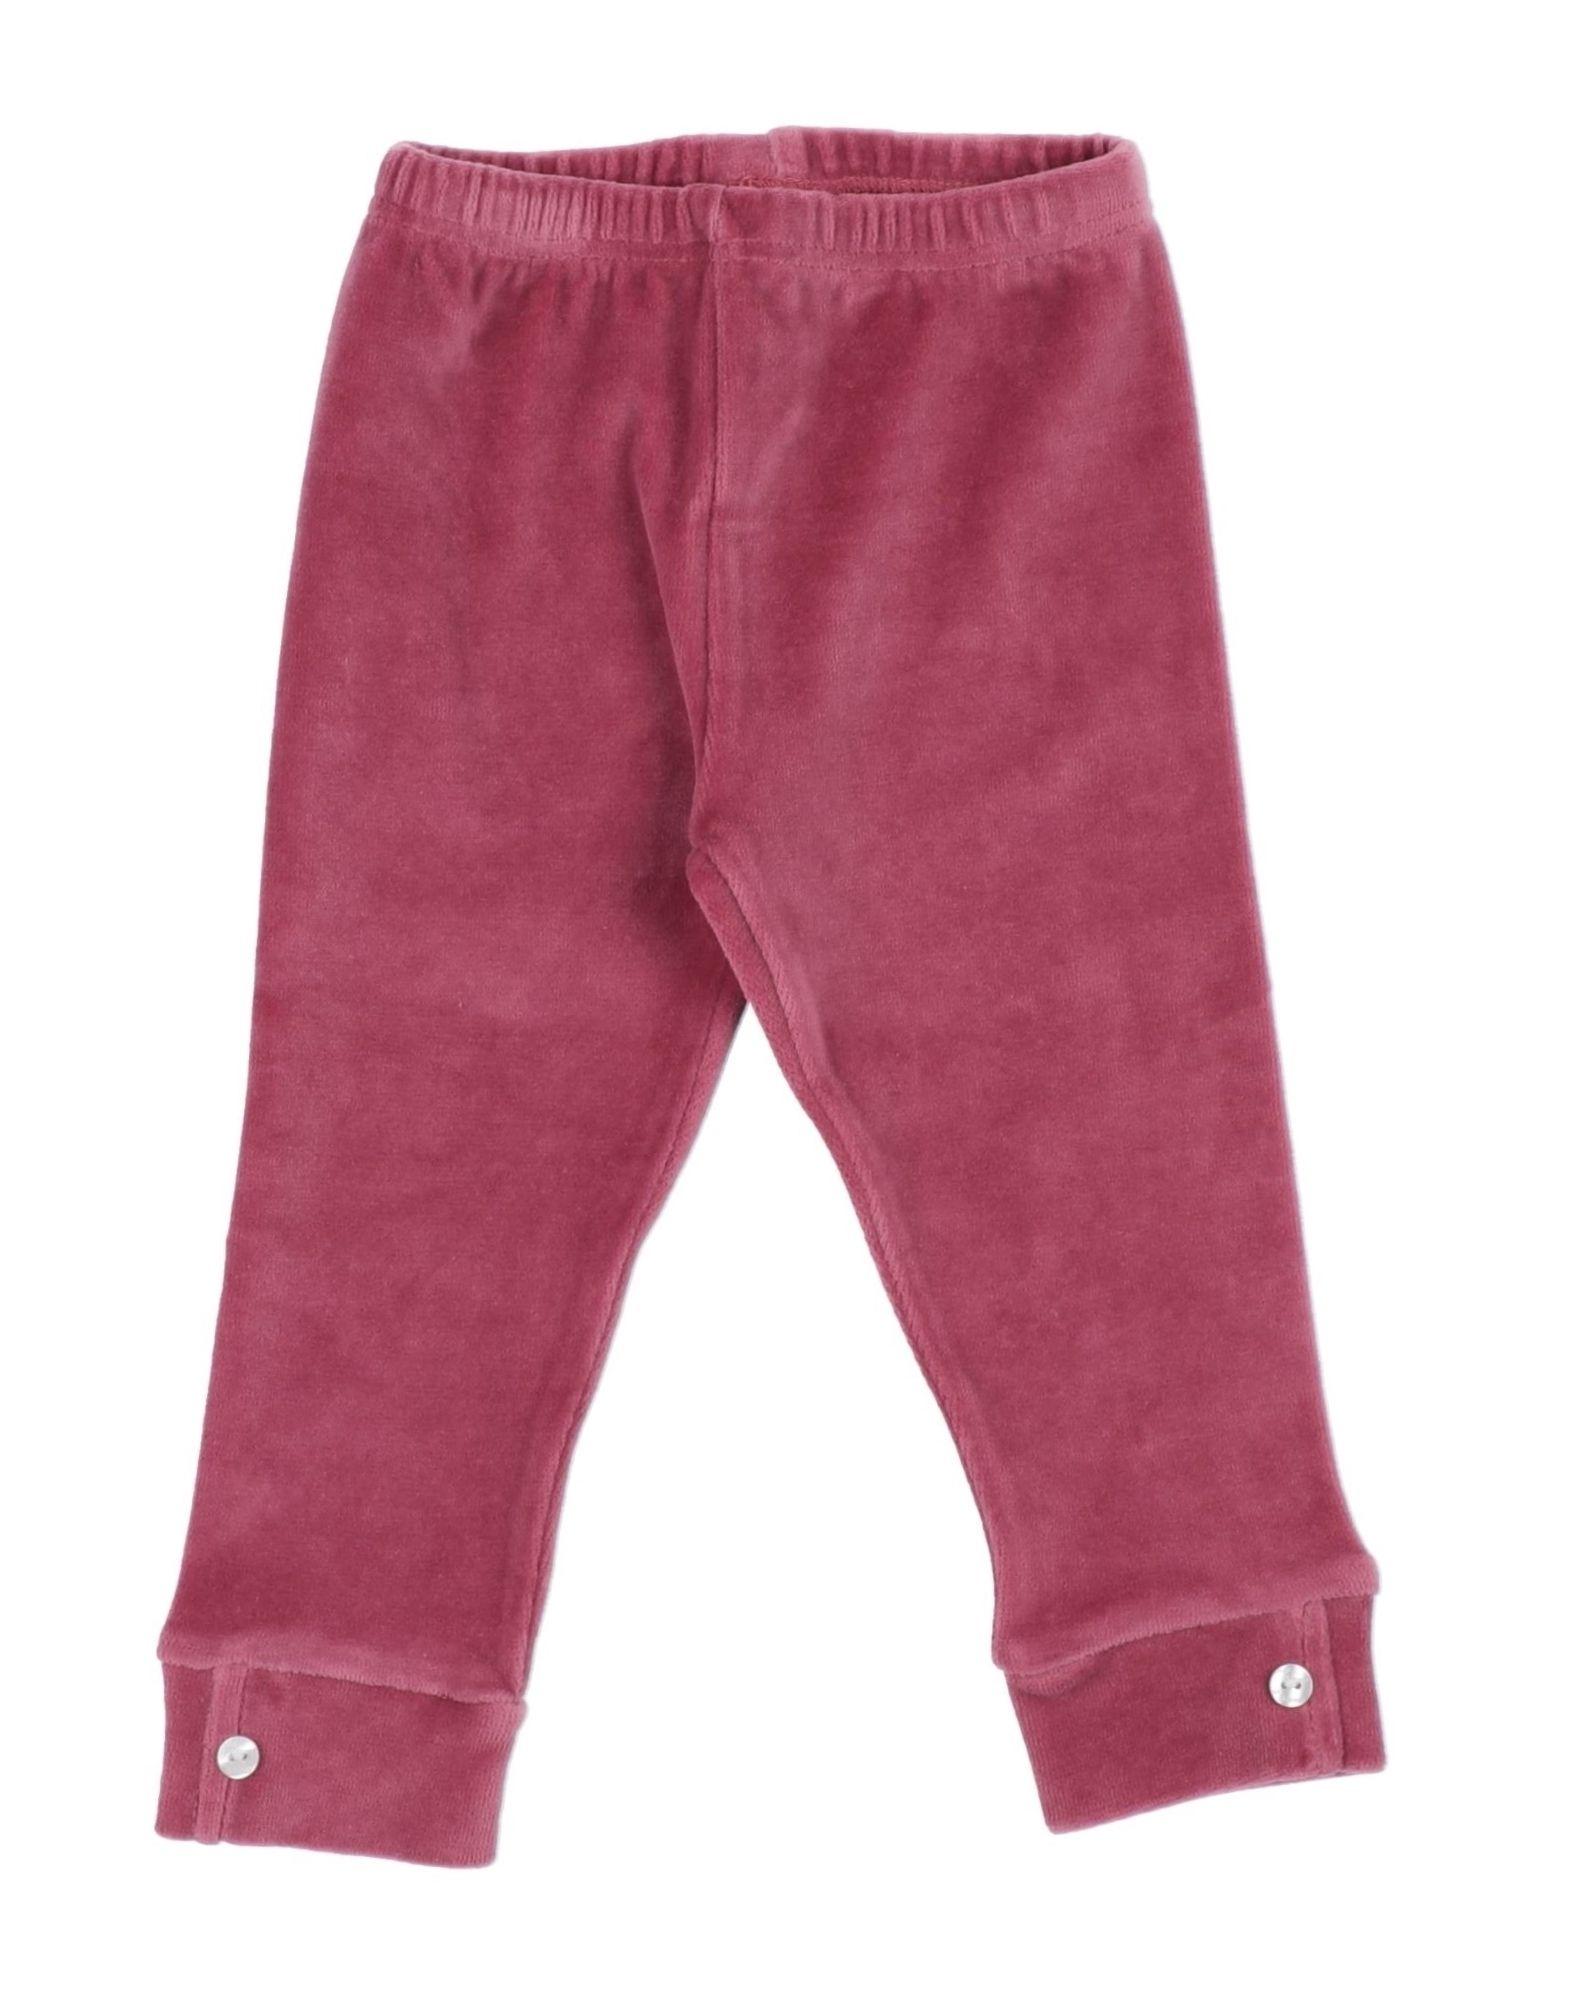 Coccodé Kids' Casual Pants In Burgundy